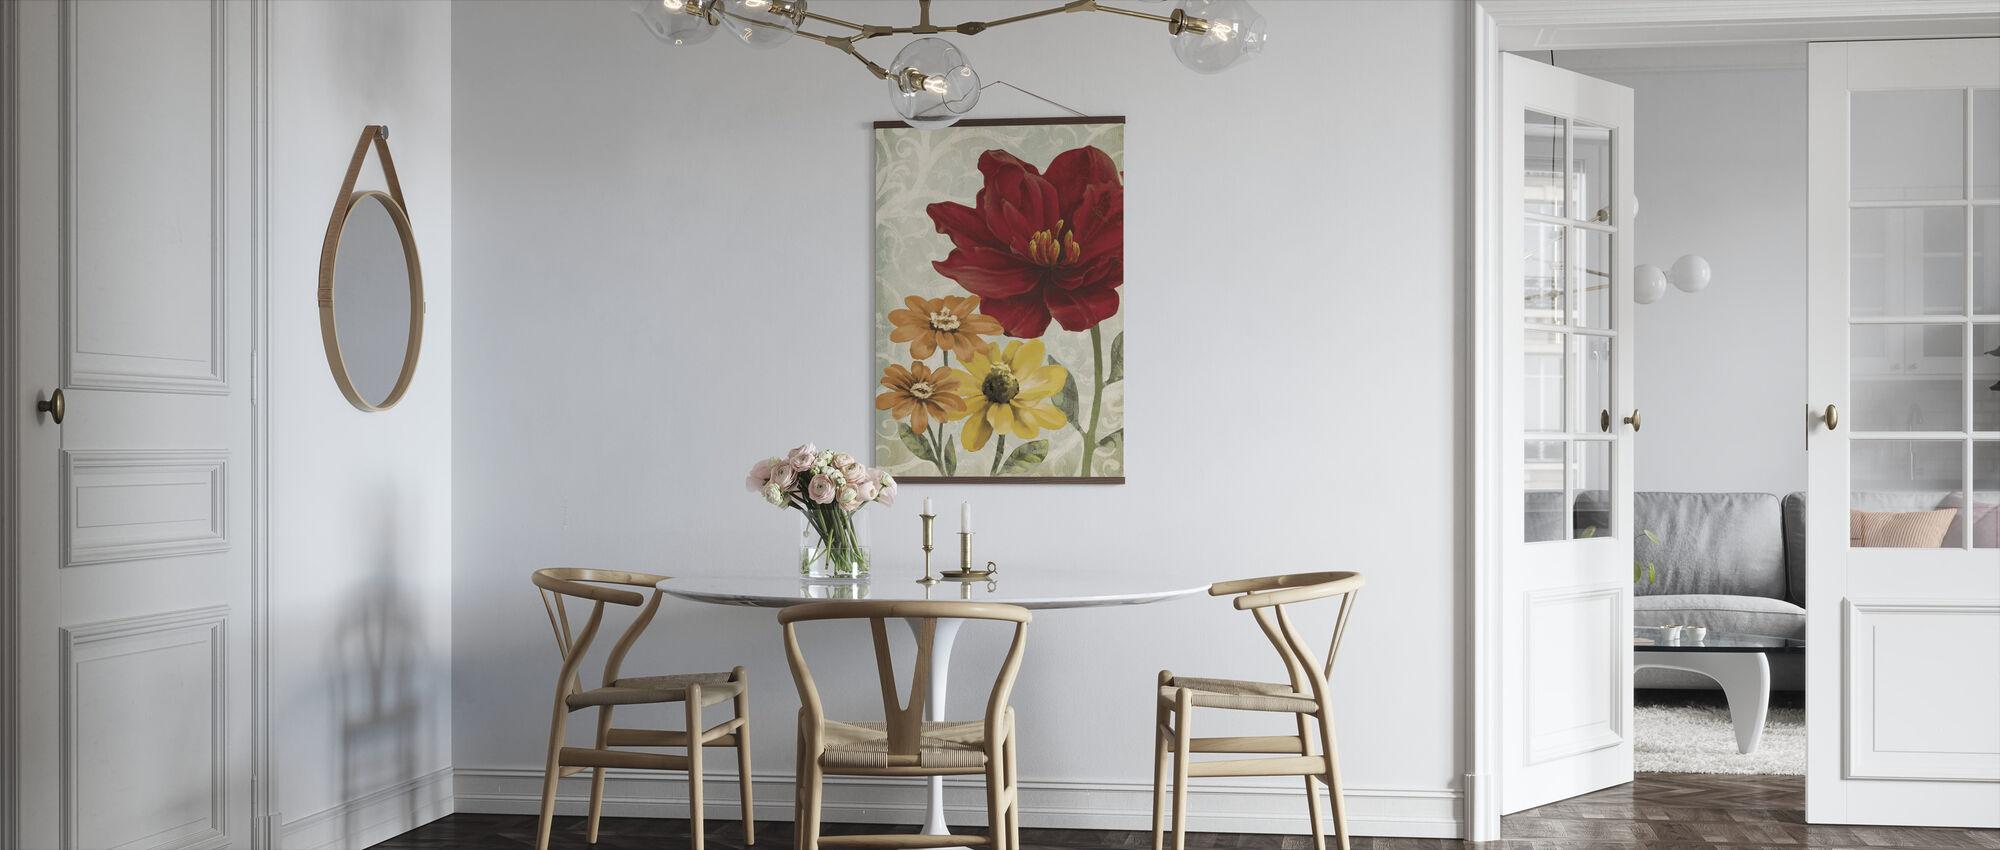 Varma blommor - Poster - Kök